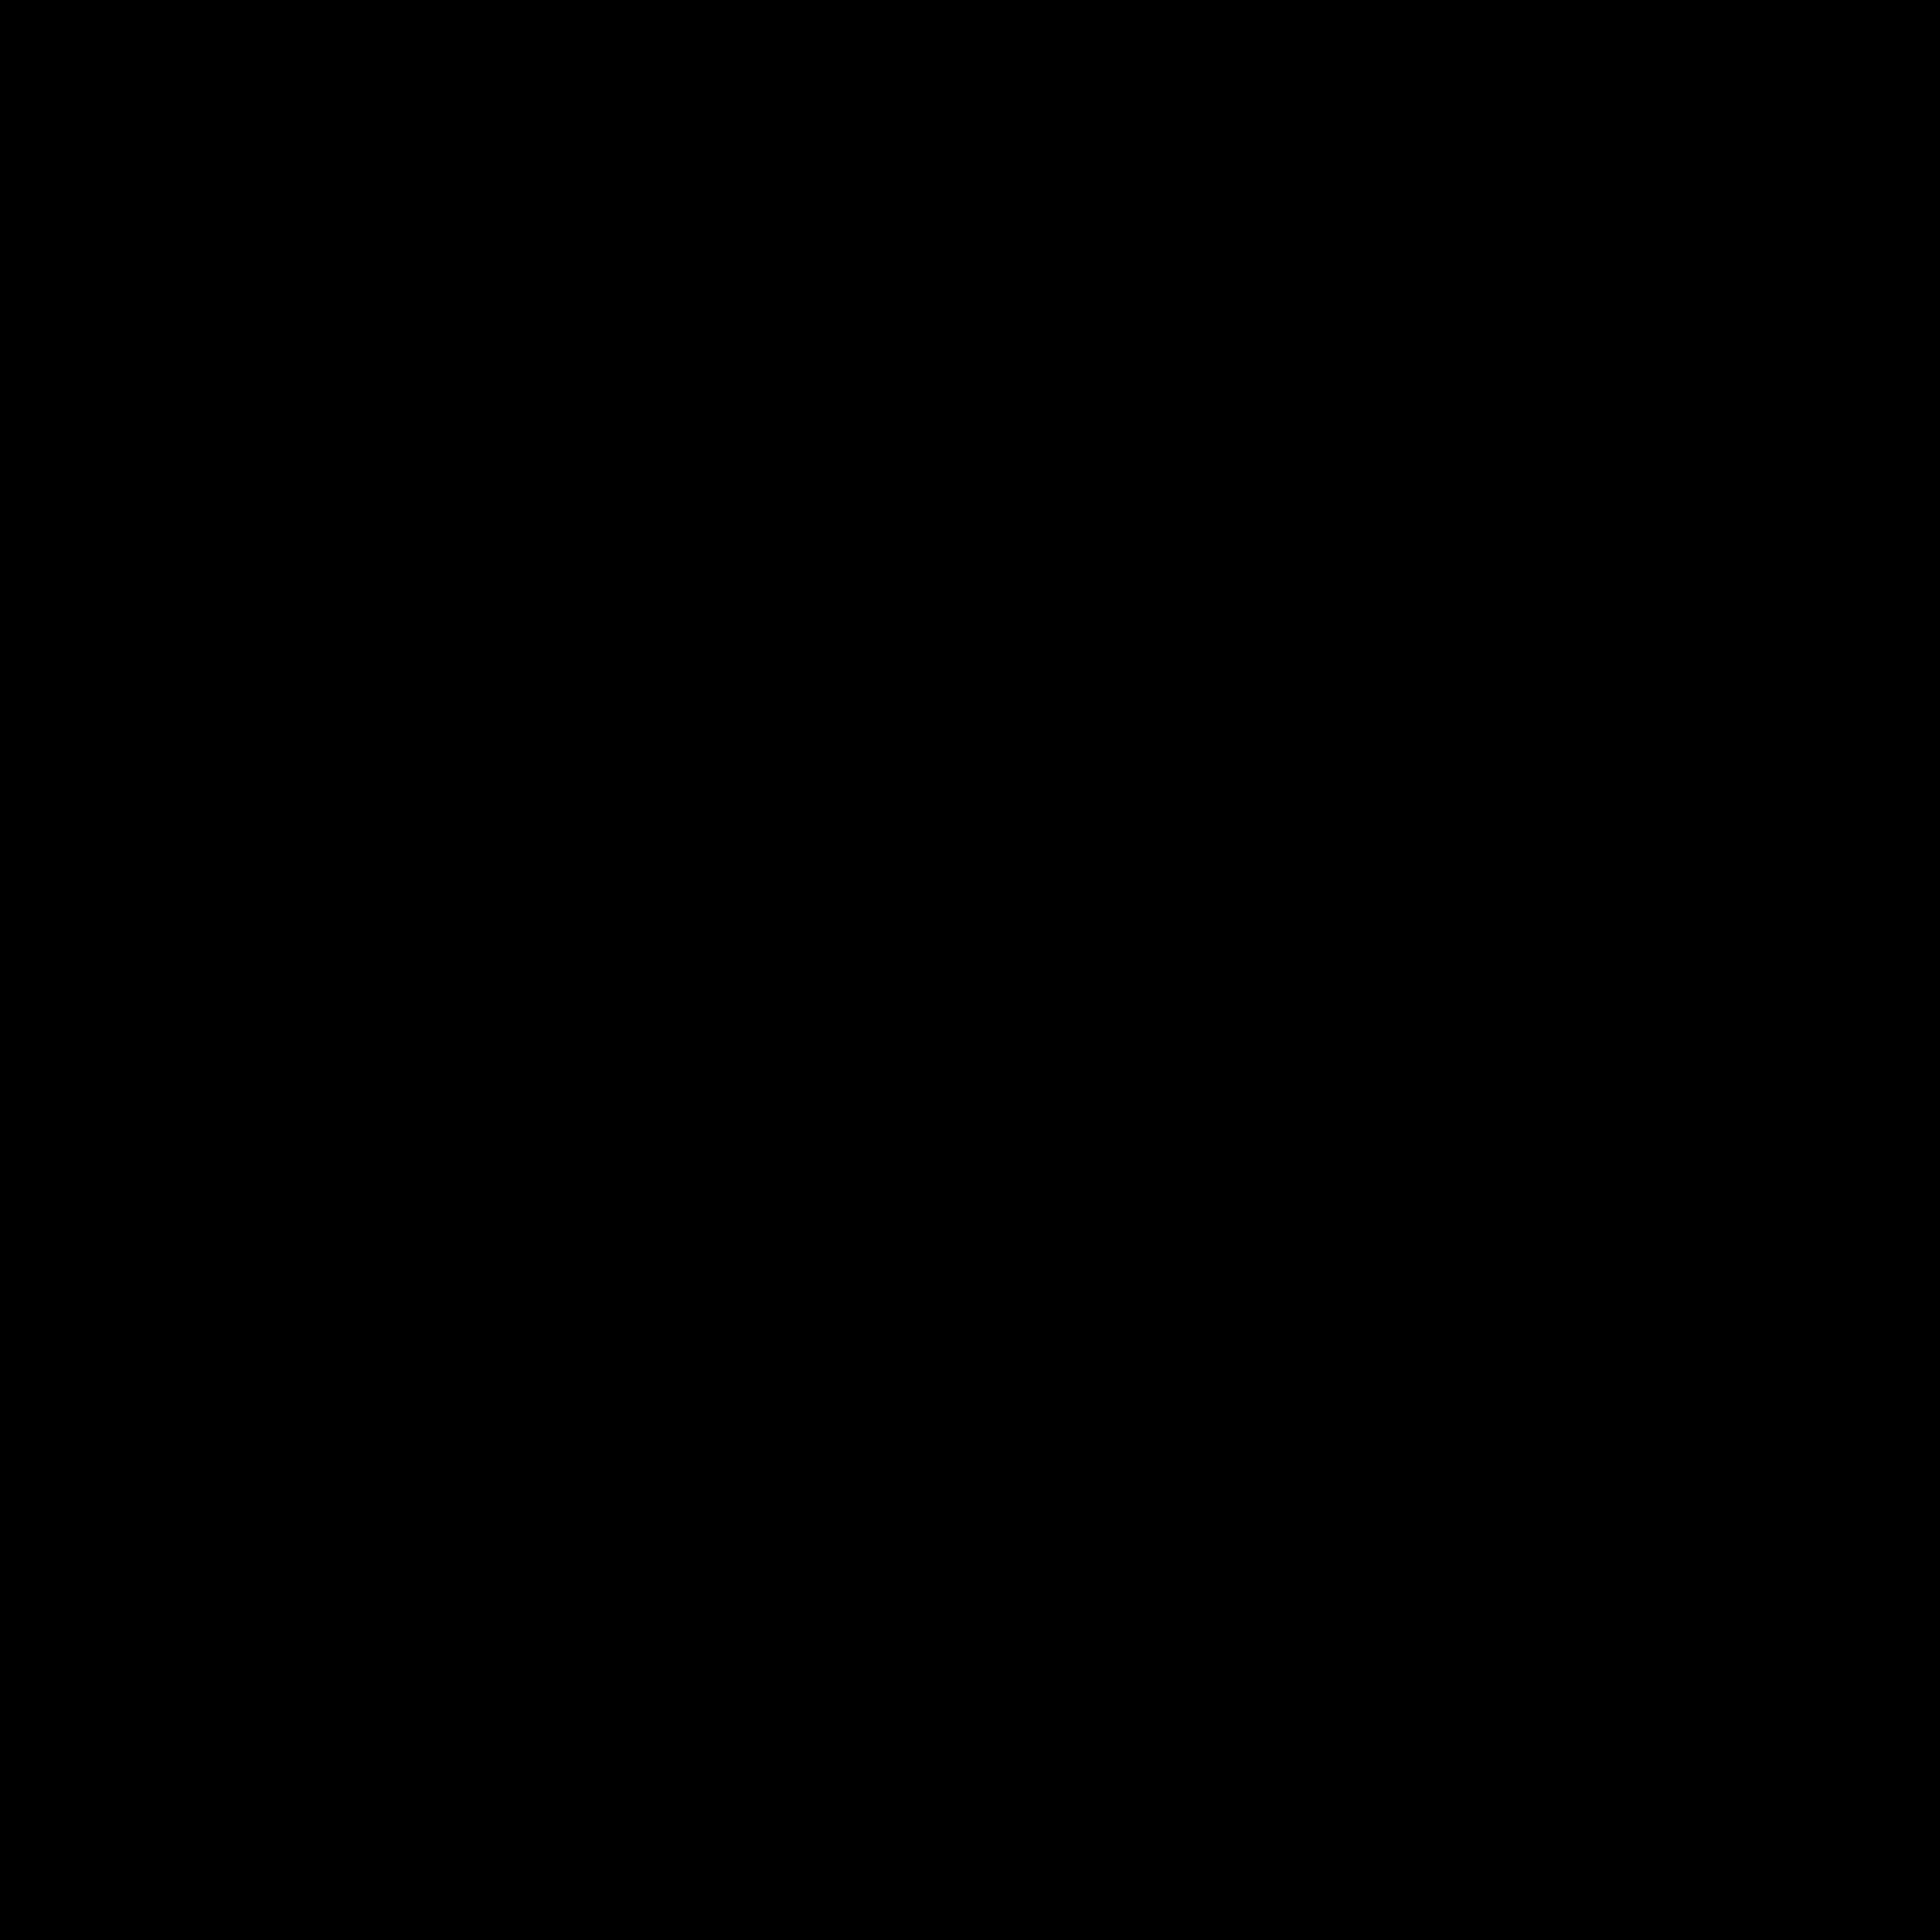 vector freeuse library woodgrain vector #88489660